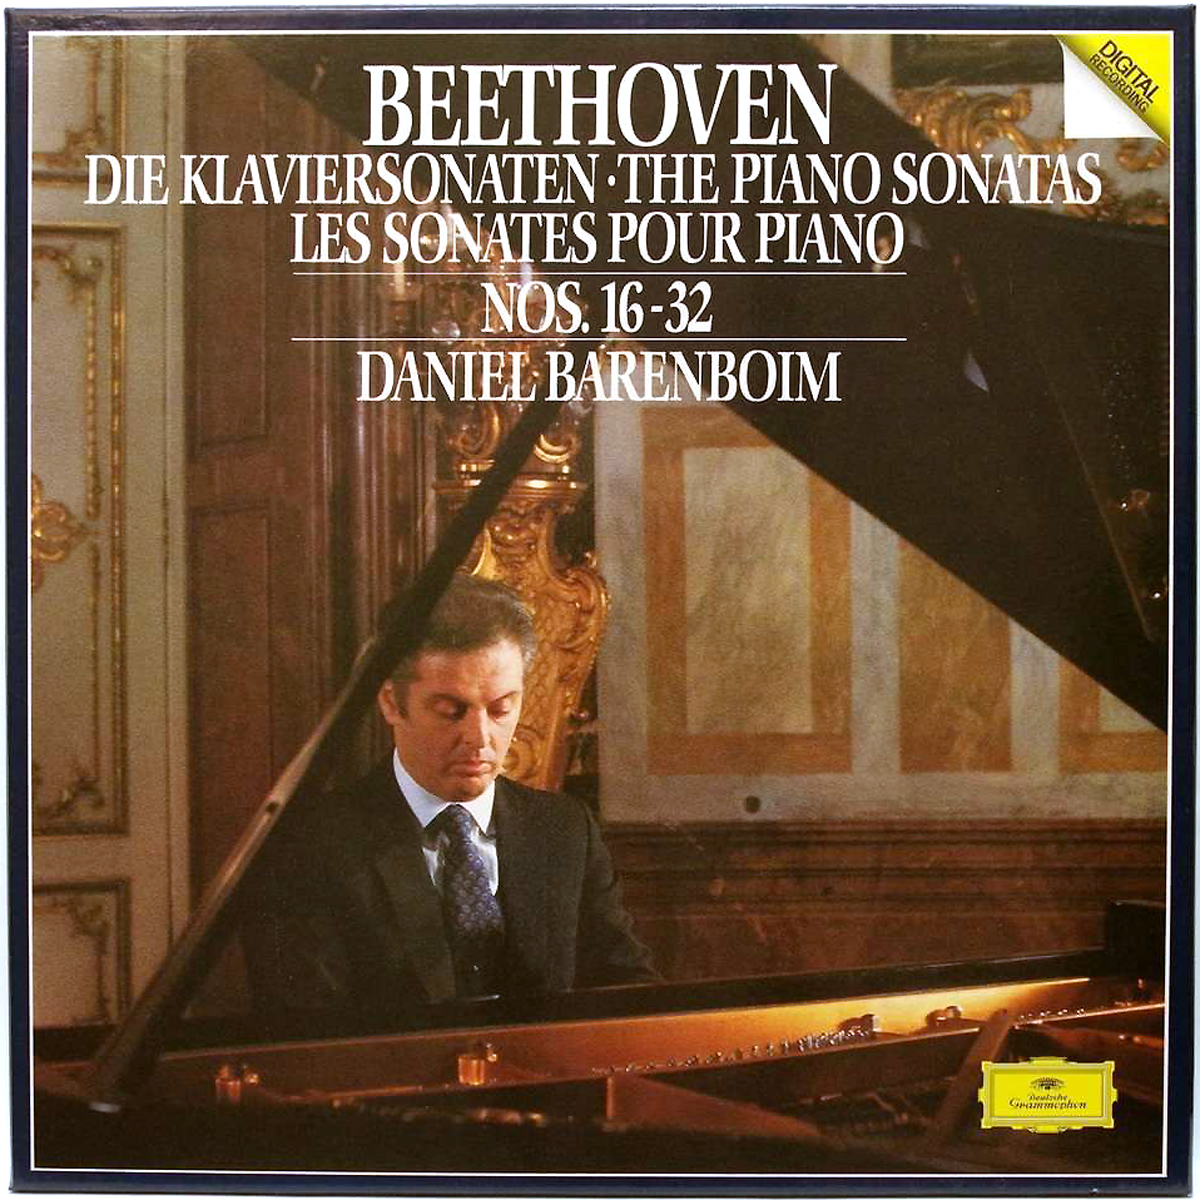 DGG 413766 Beethoven Sonates 16 à 32 Barenboim DGG Digital Aufnahme